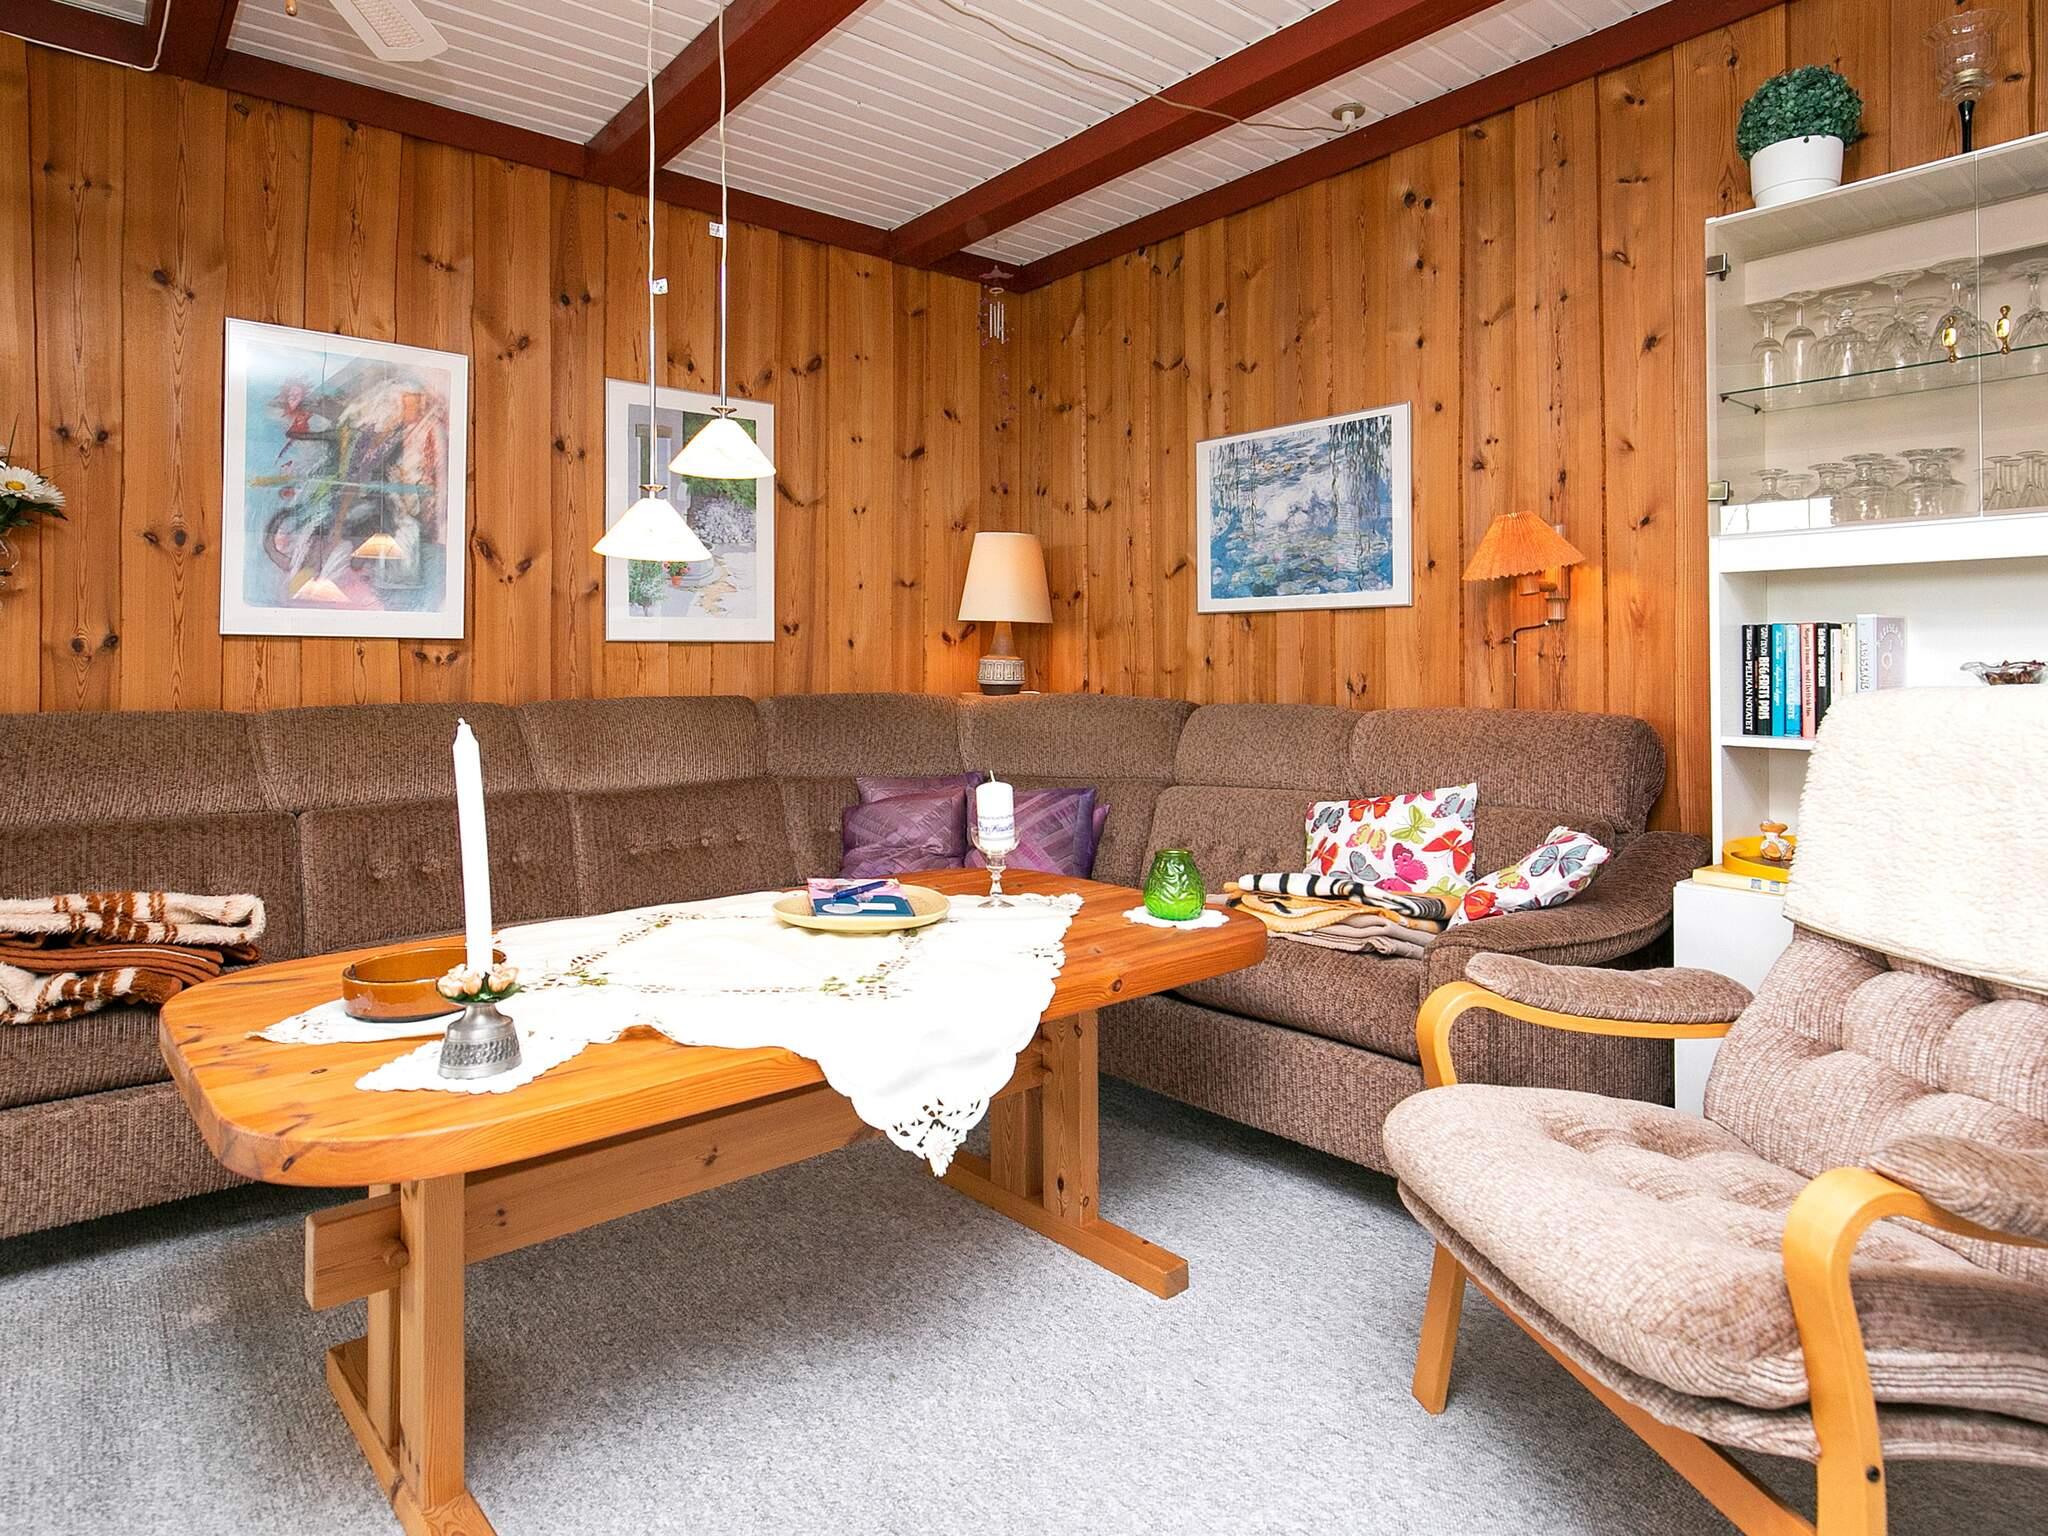 Maison de vacances Eskov Strandpark (610274), Roslev, , Limfjord, Danemark, image 2